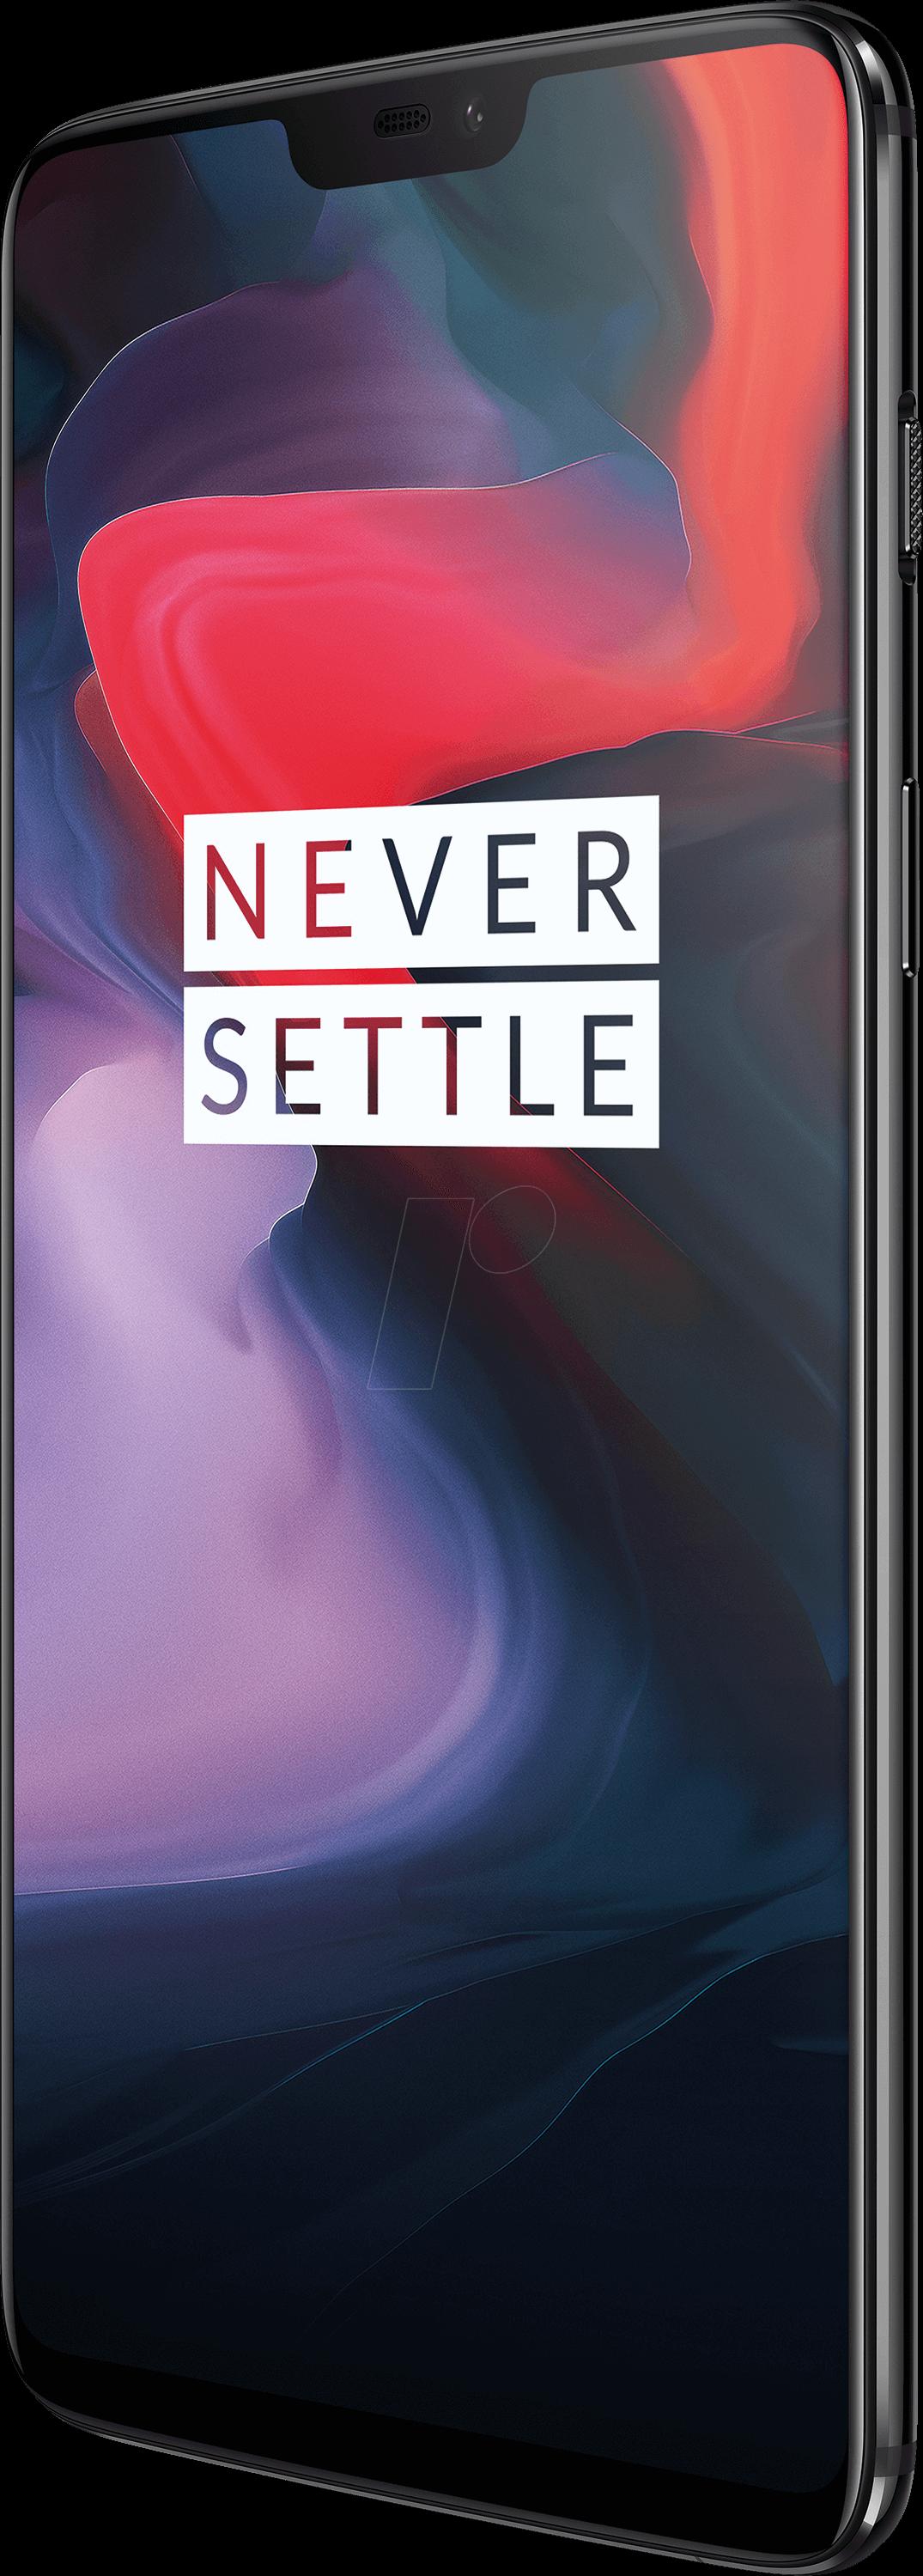 6 128 - OnePlus 6, 128GB, mirror black EU